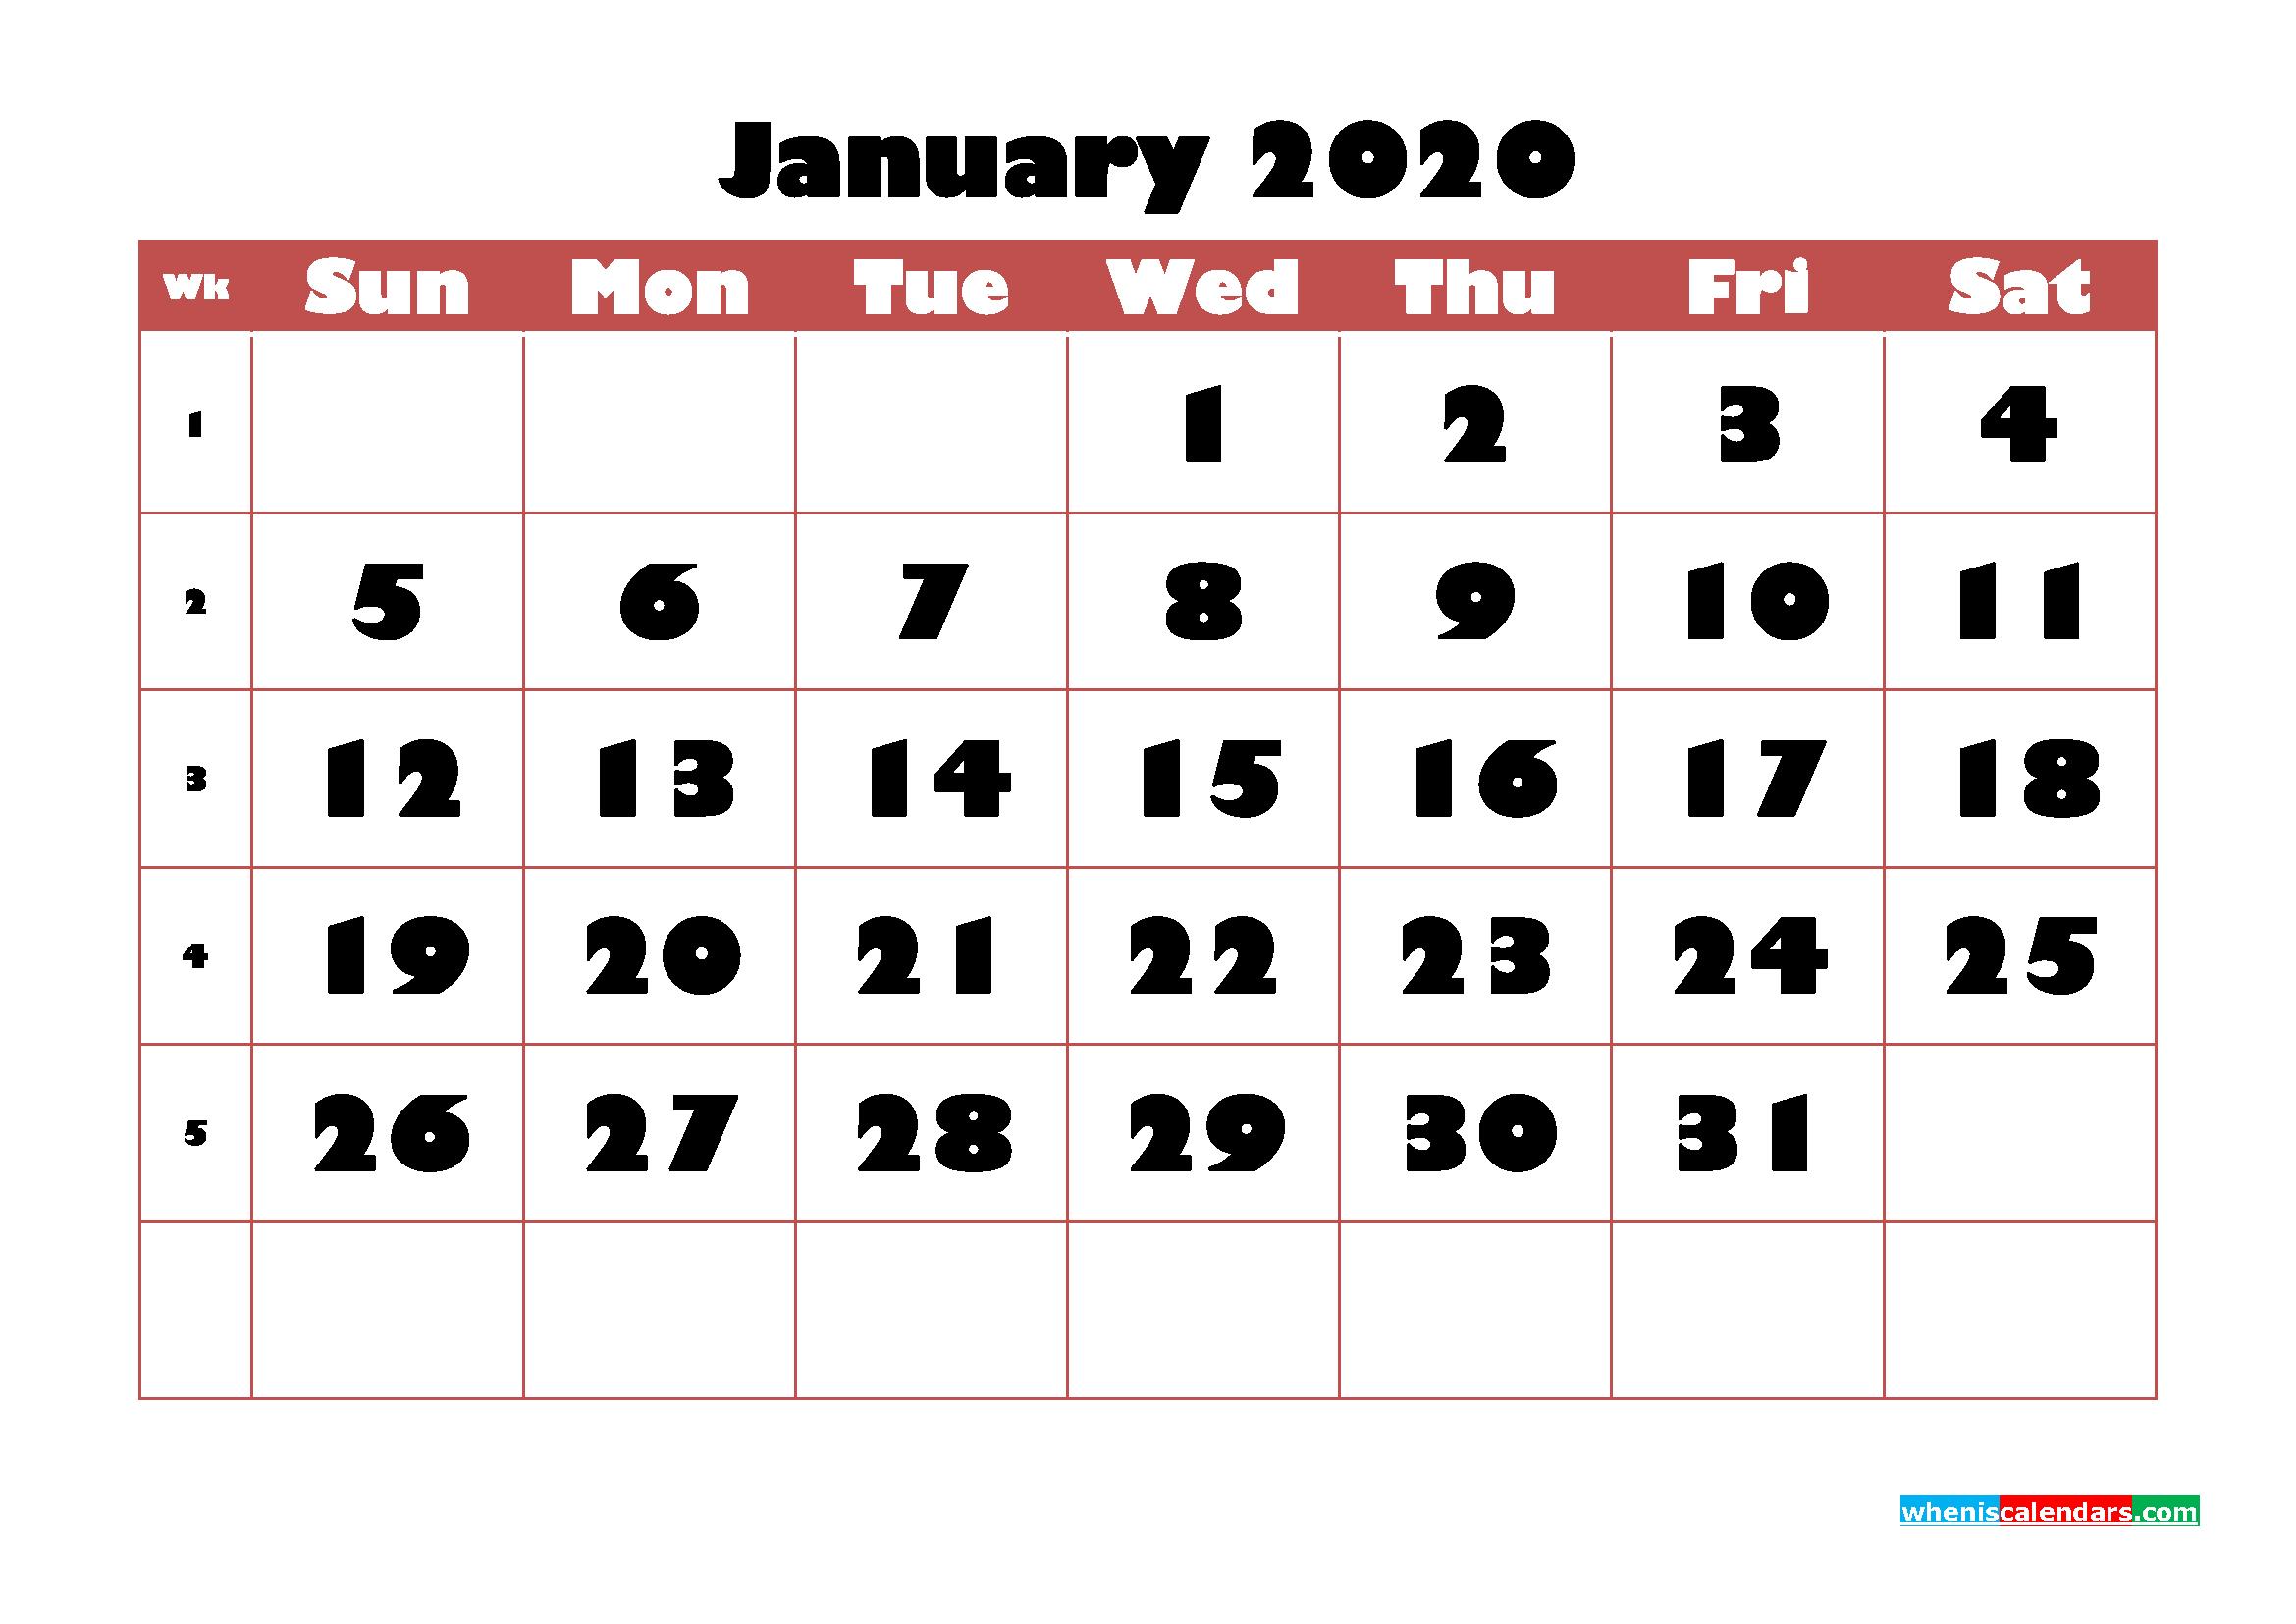 Free Printable Calendar January 2020 PDF, Word - No.m20b721